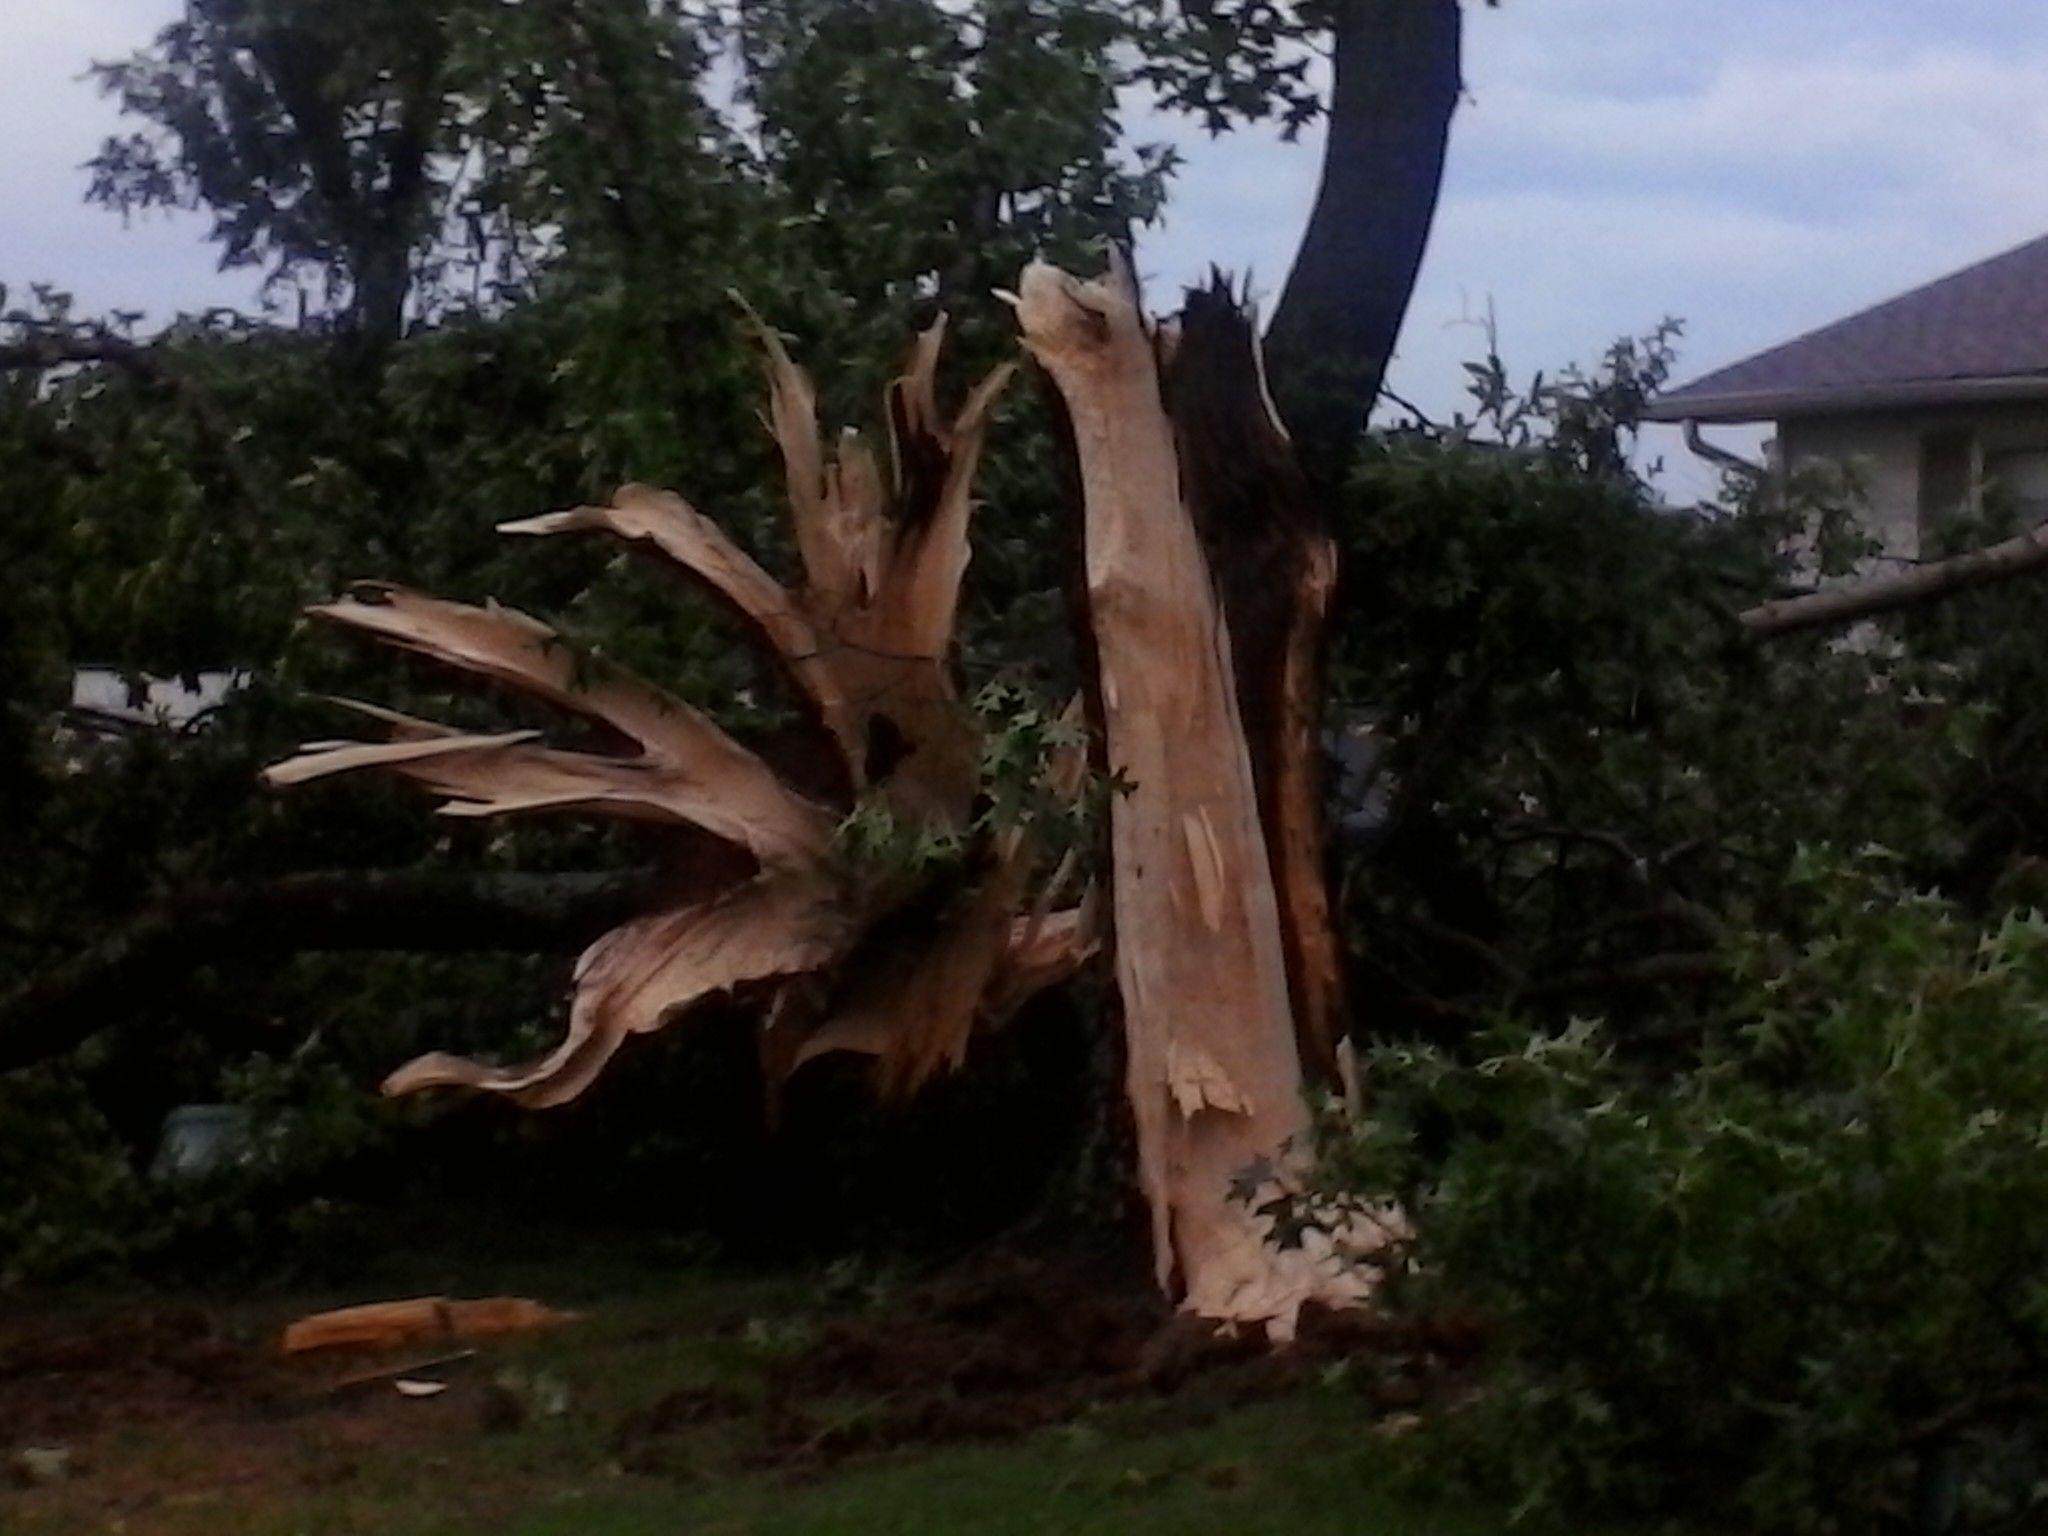 August 2014 Arkansas Storm Damage by kljacobs